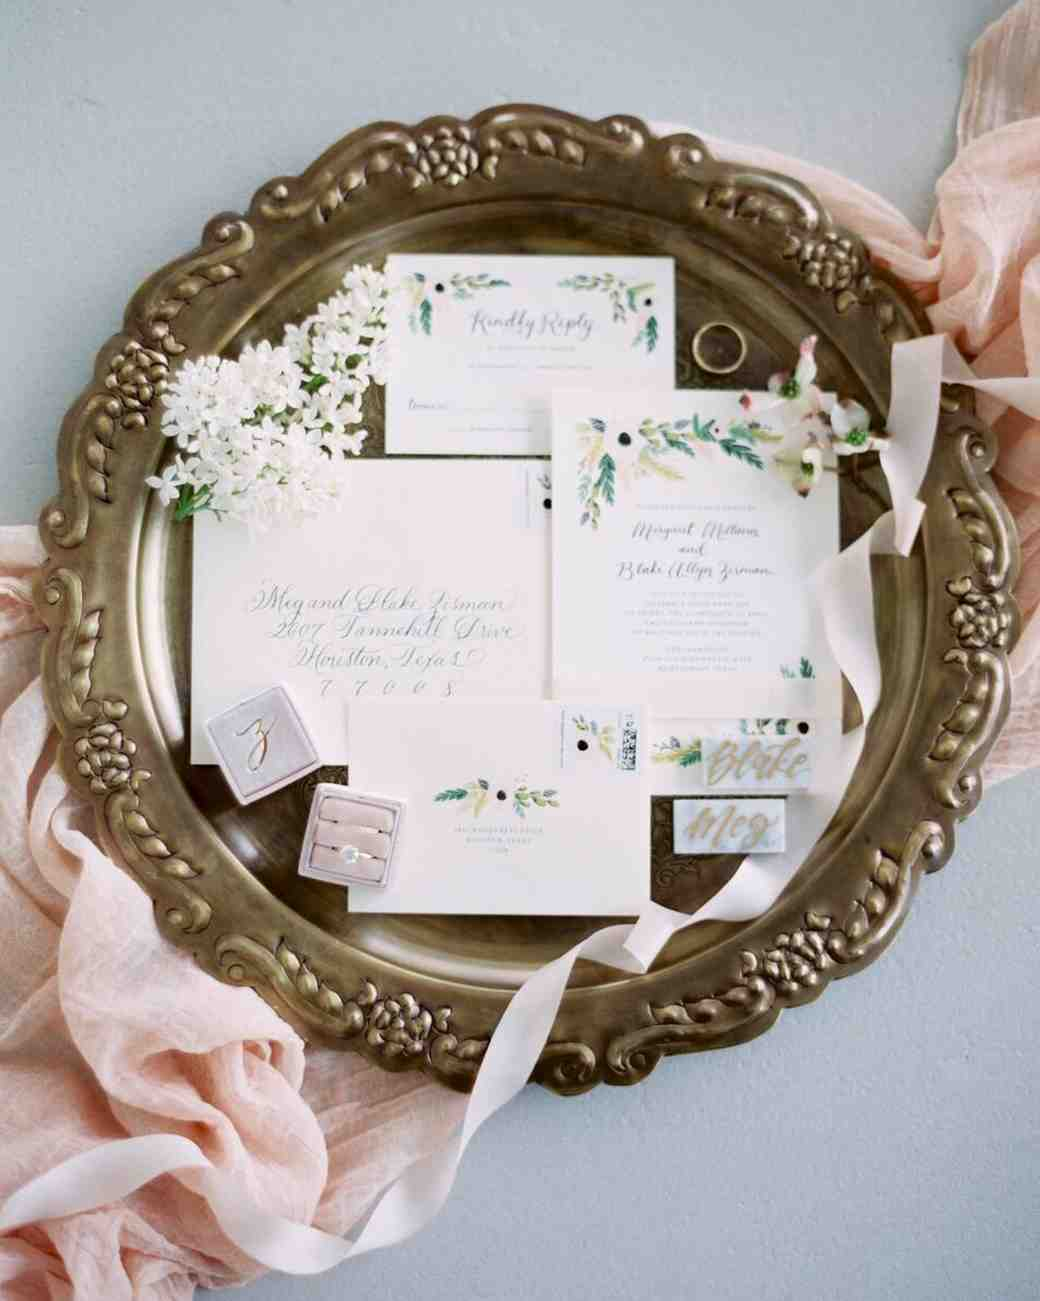 Floral Wedding Invitation: Spring Bird Themed Wedding Invitations At Reisefeber.org